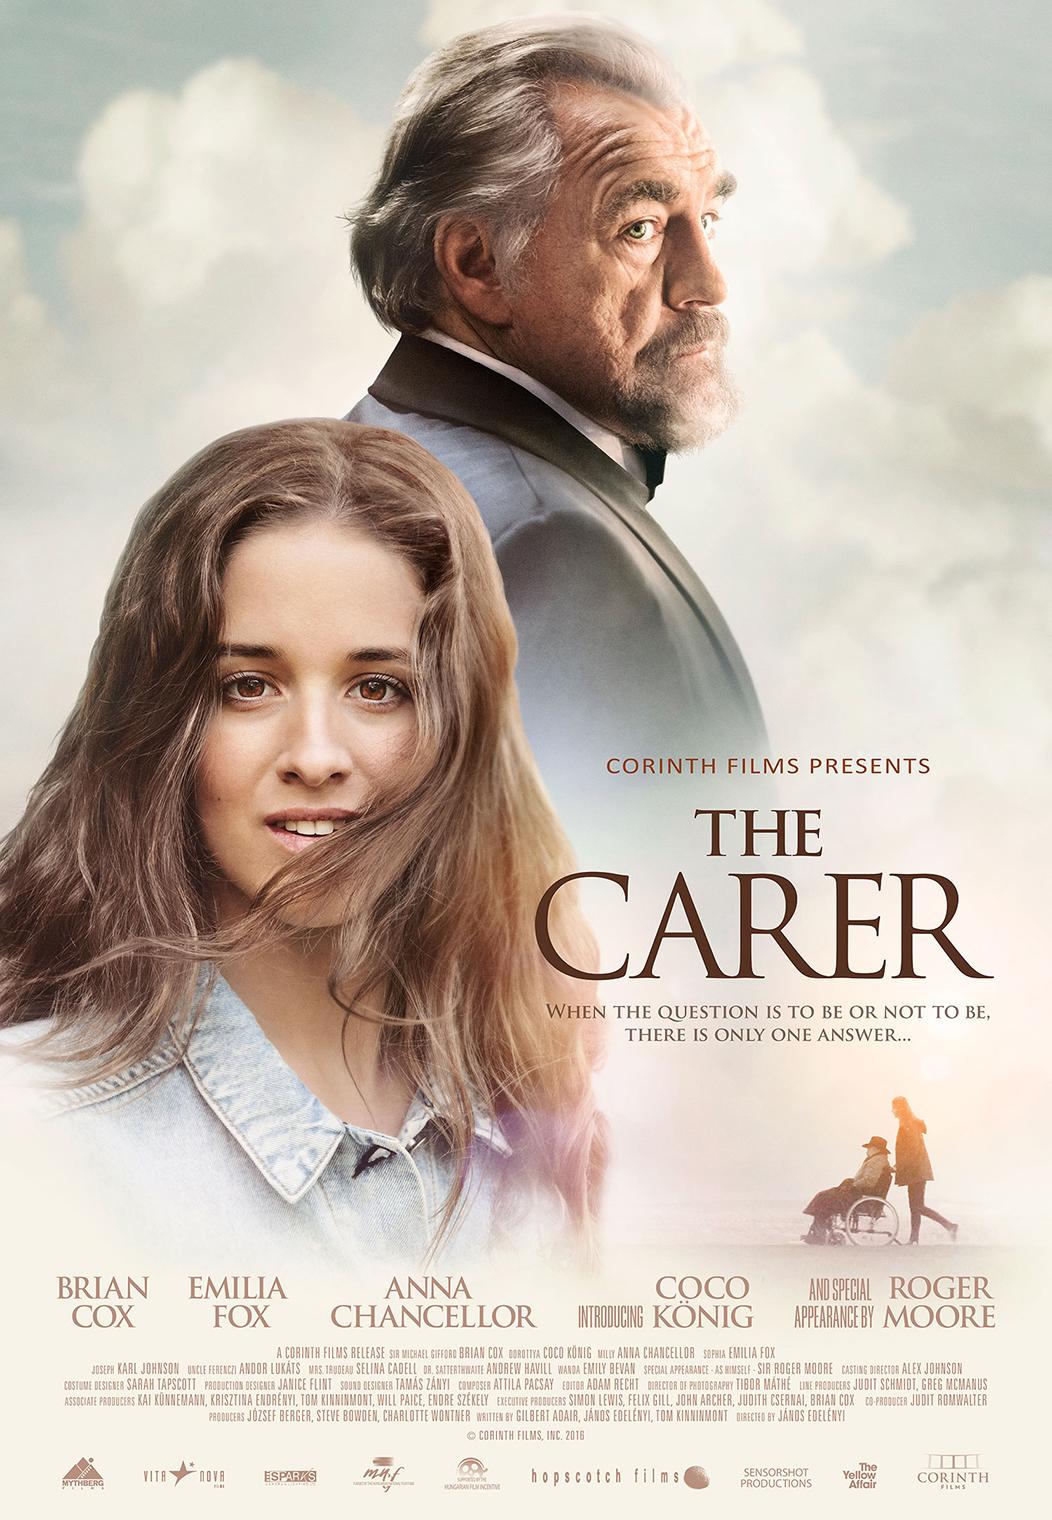 The Carer 2016 cover larg - دانلود فیلم پرستار The Carer 2016